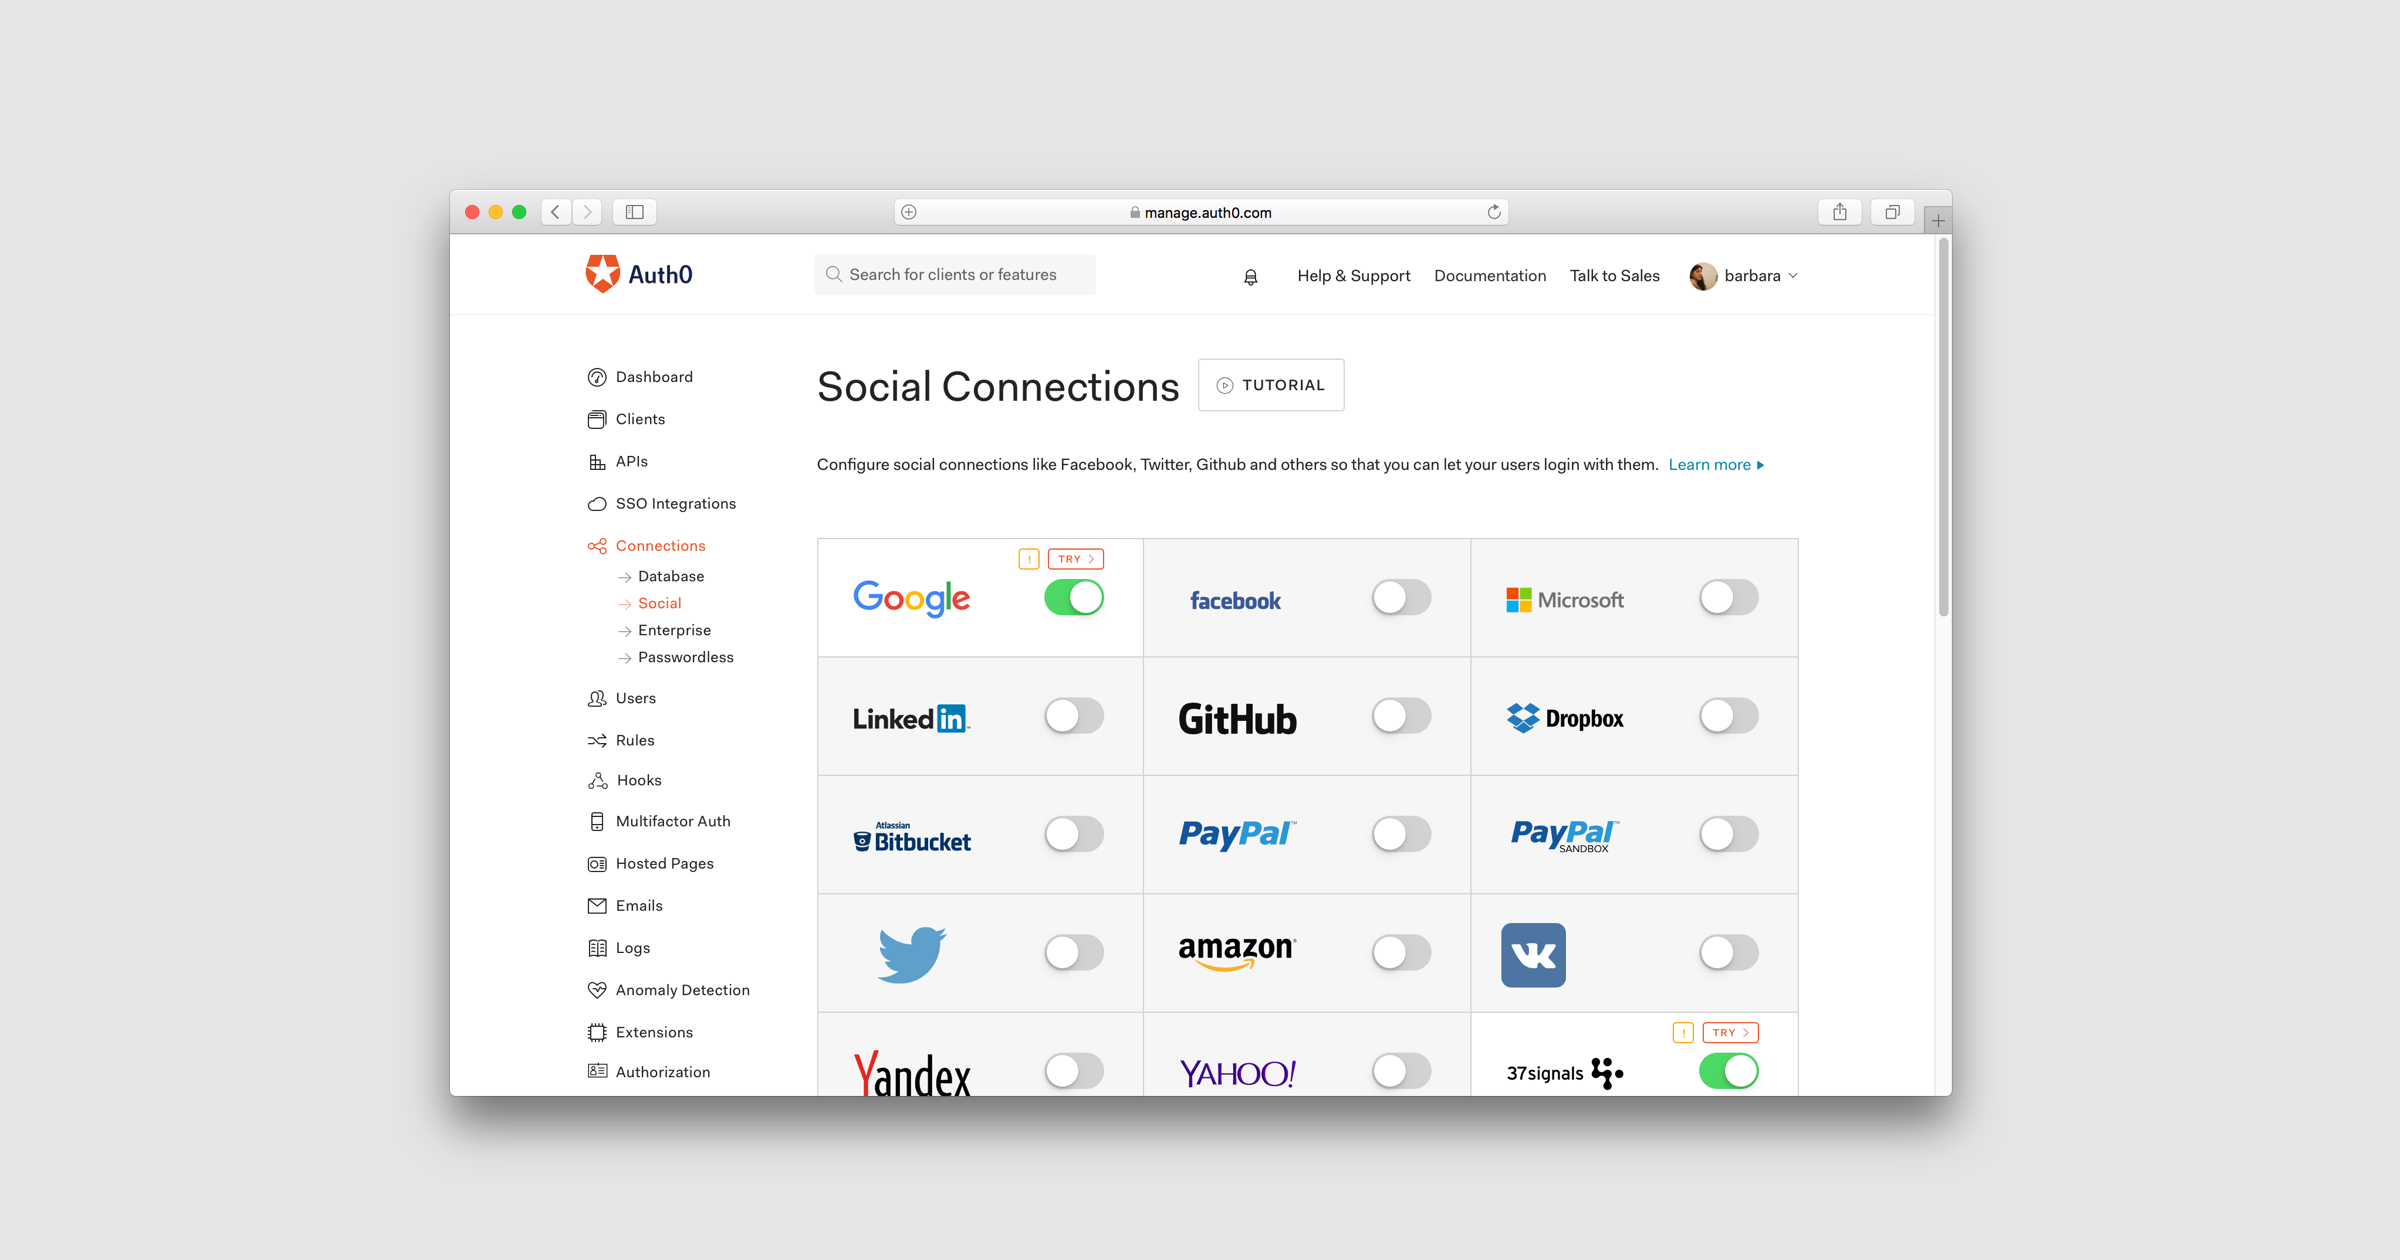 Auth0 social login integrations